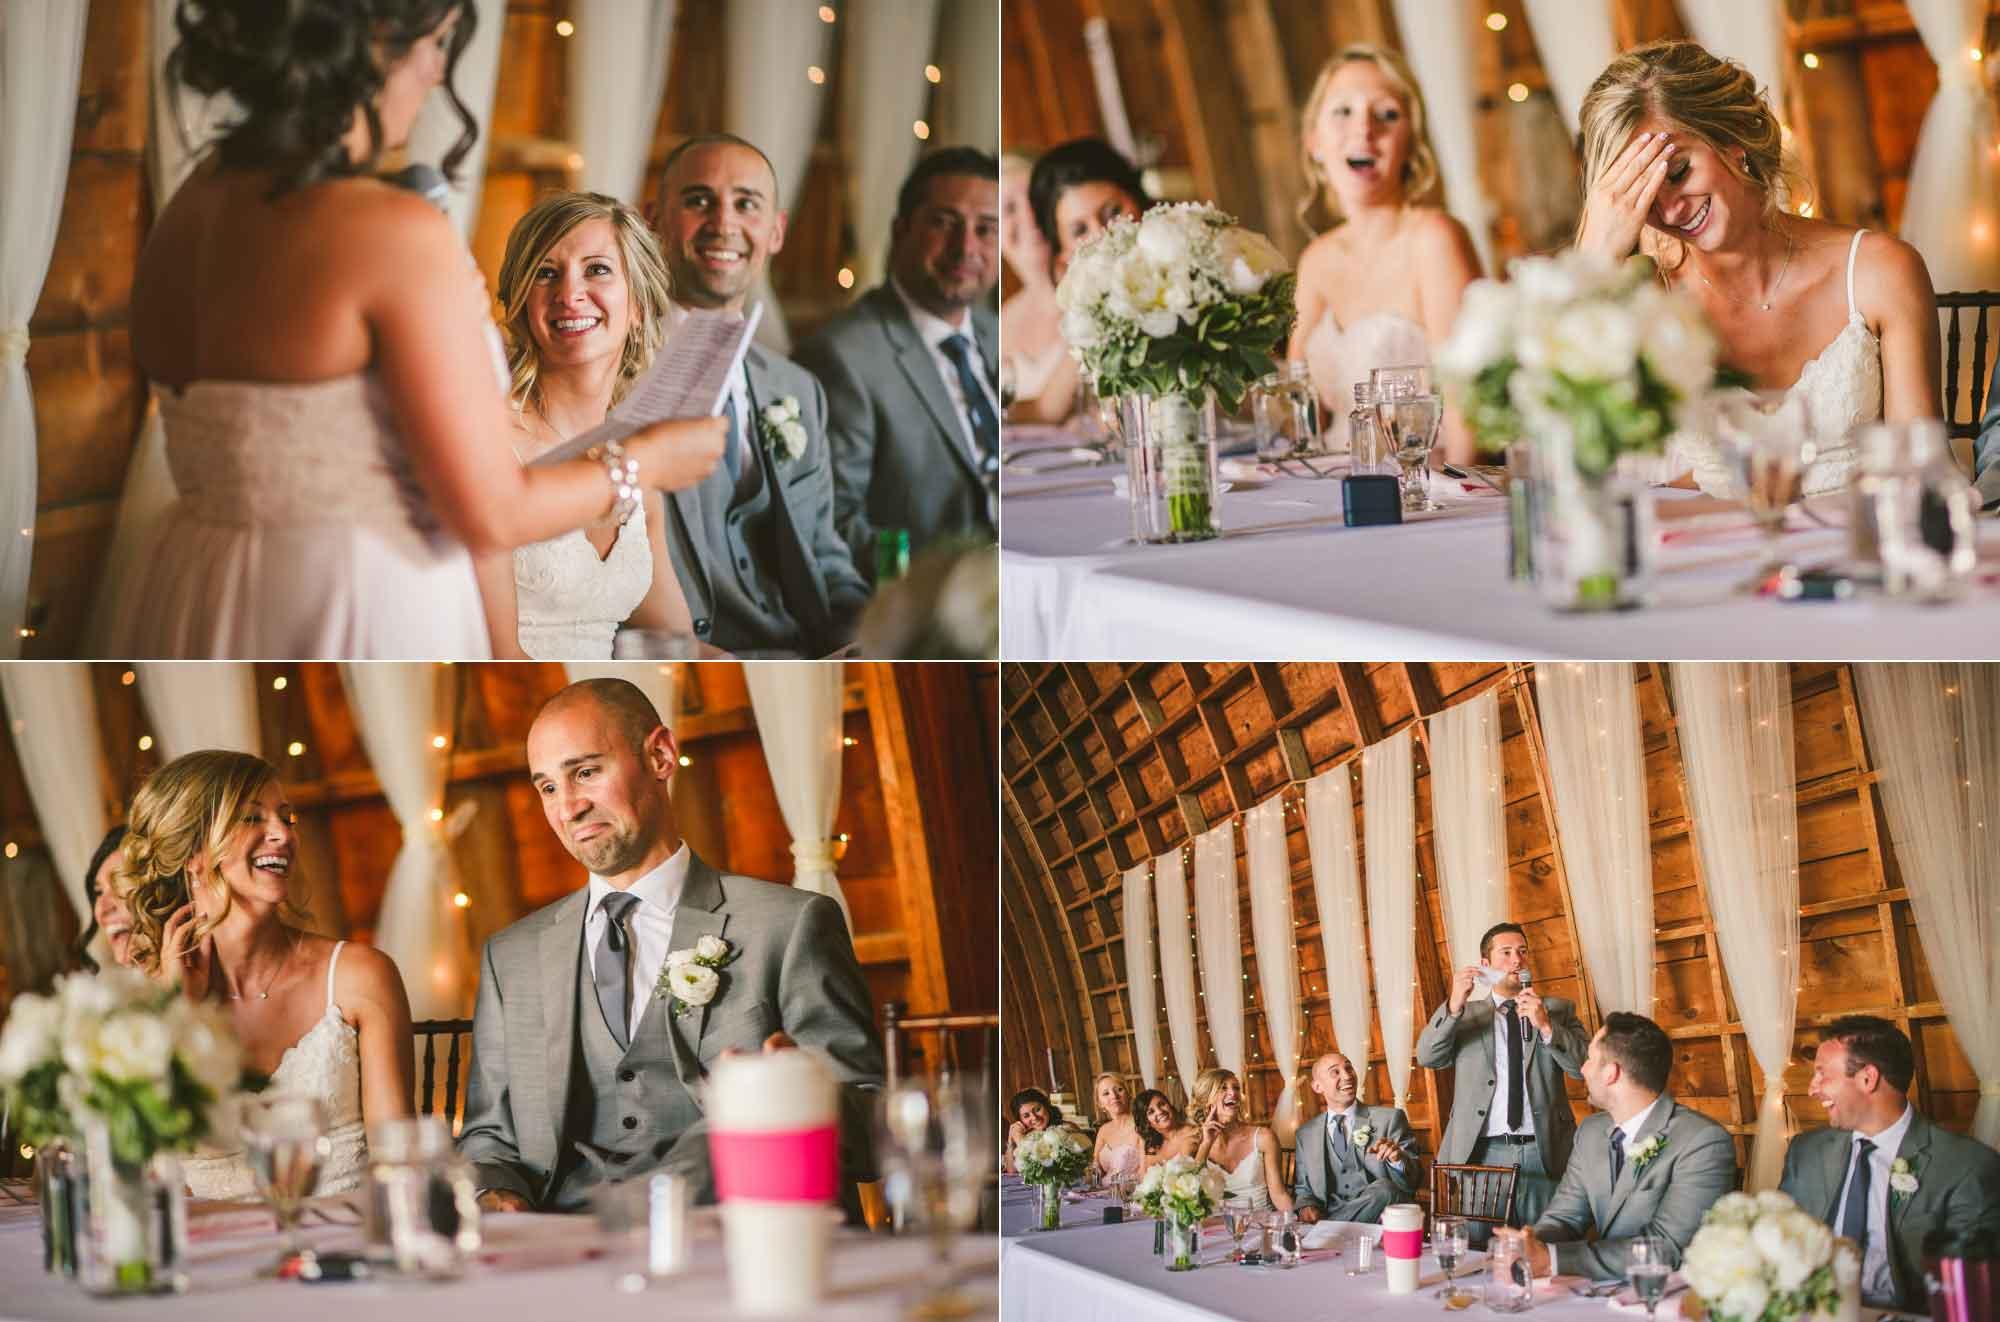 22-barn-wedding-reception-toasts.jpg